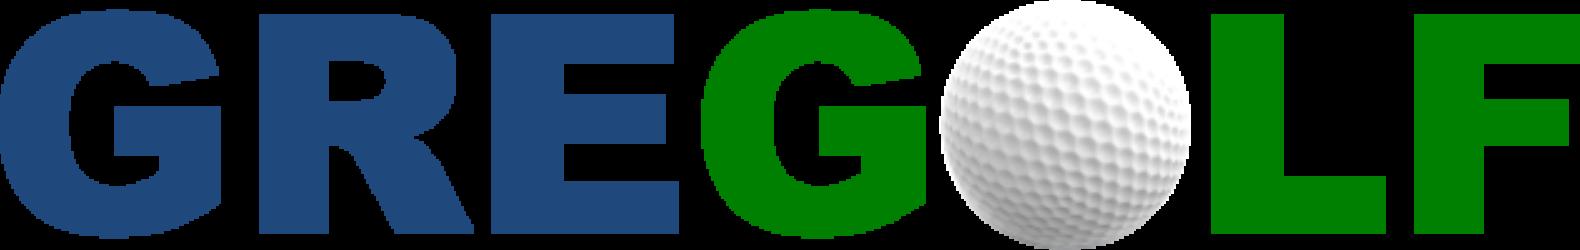 GreGolf